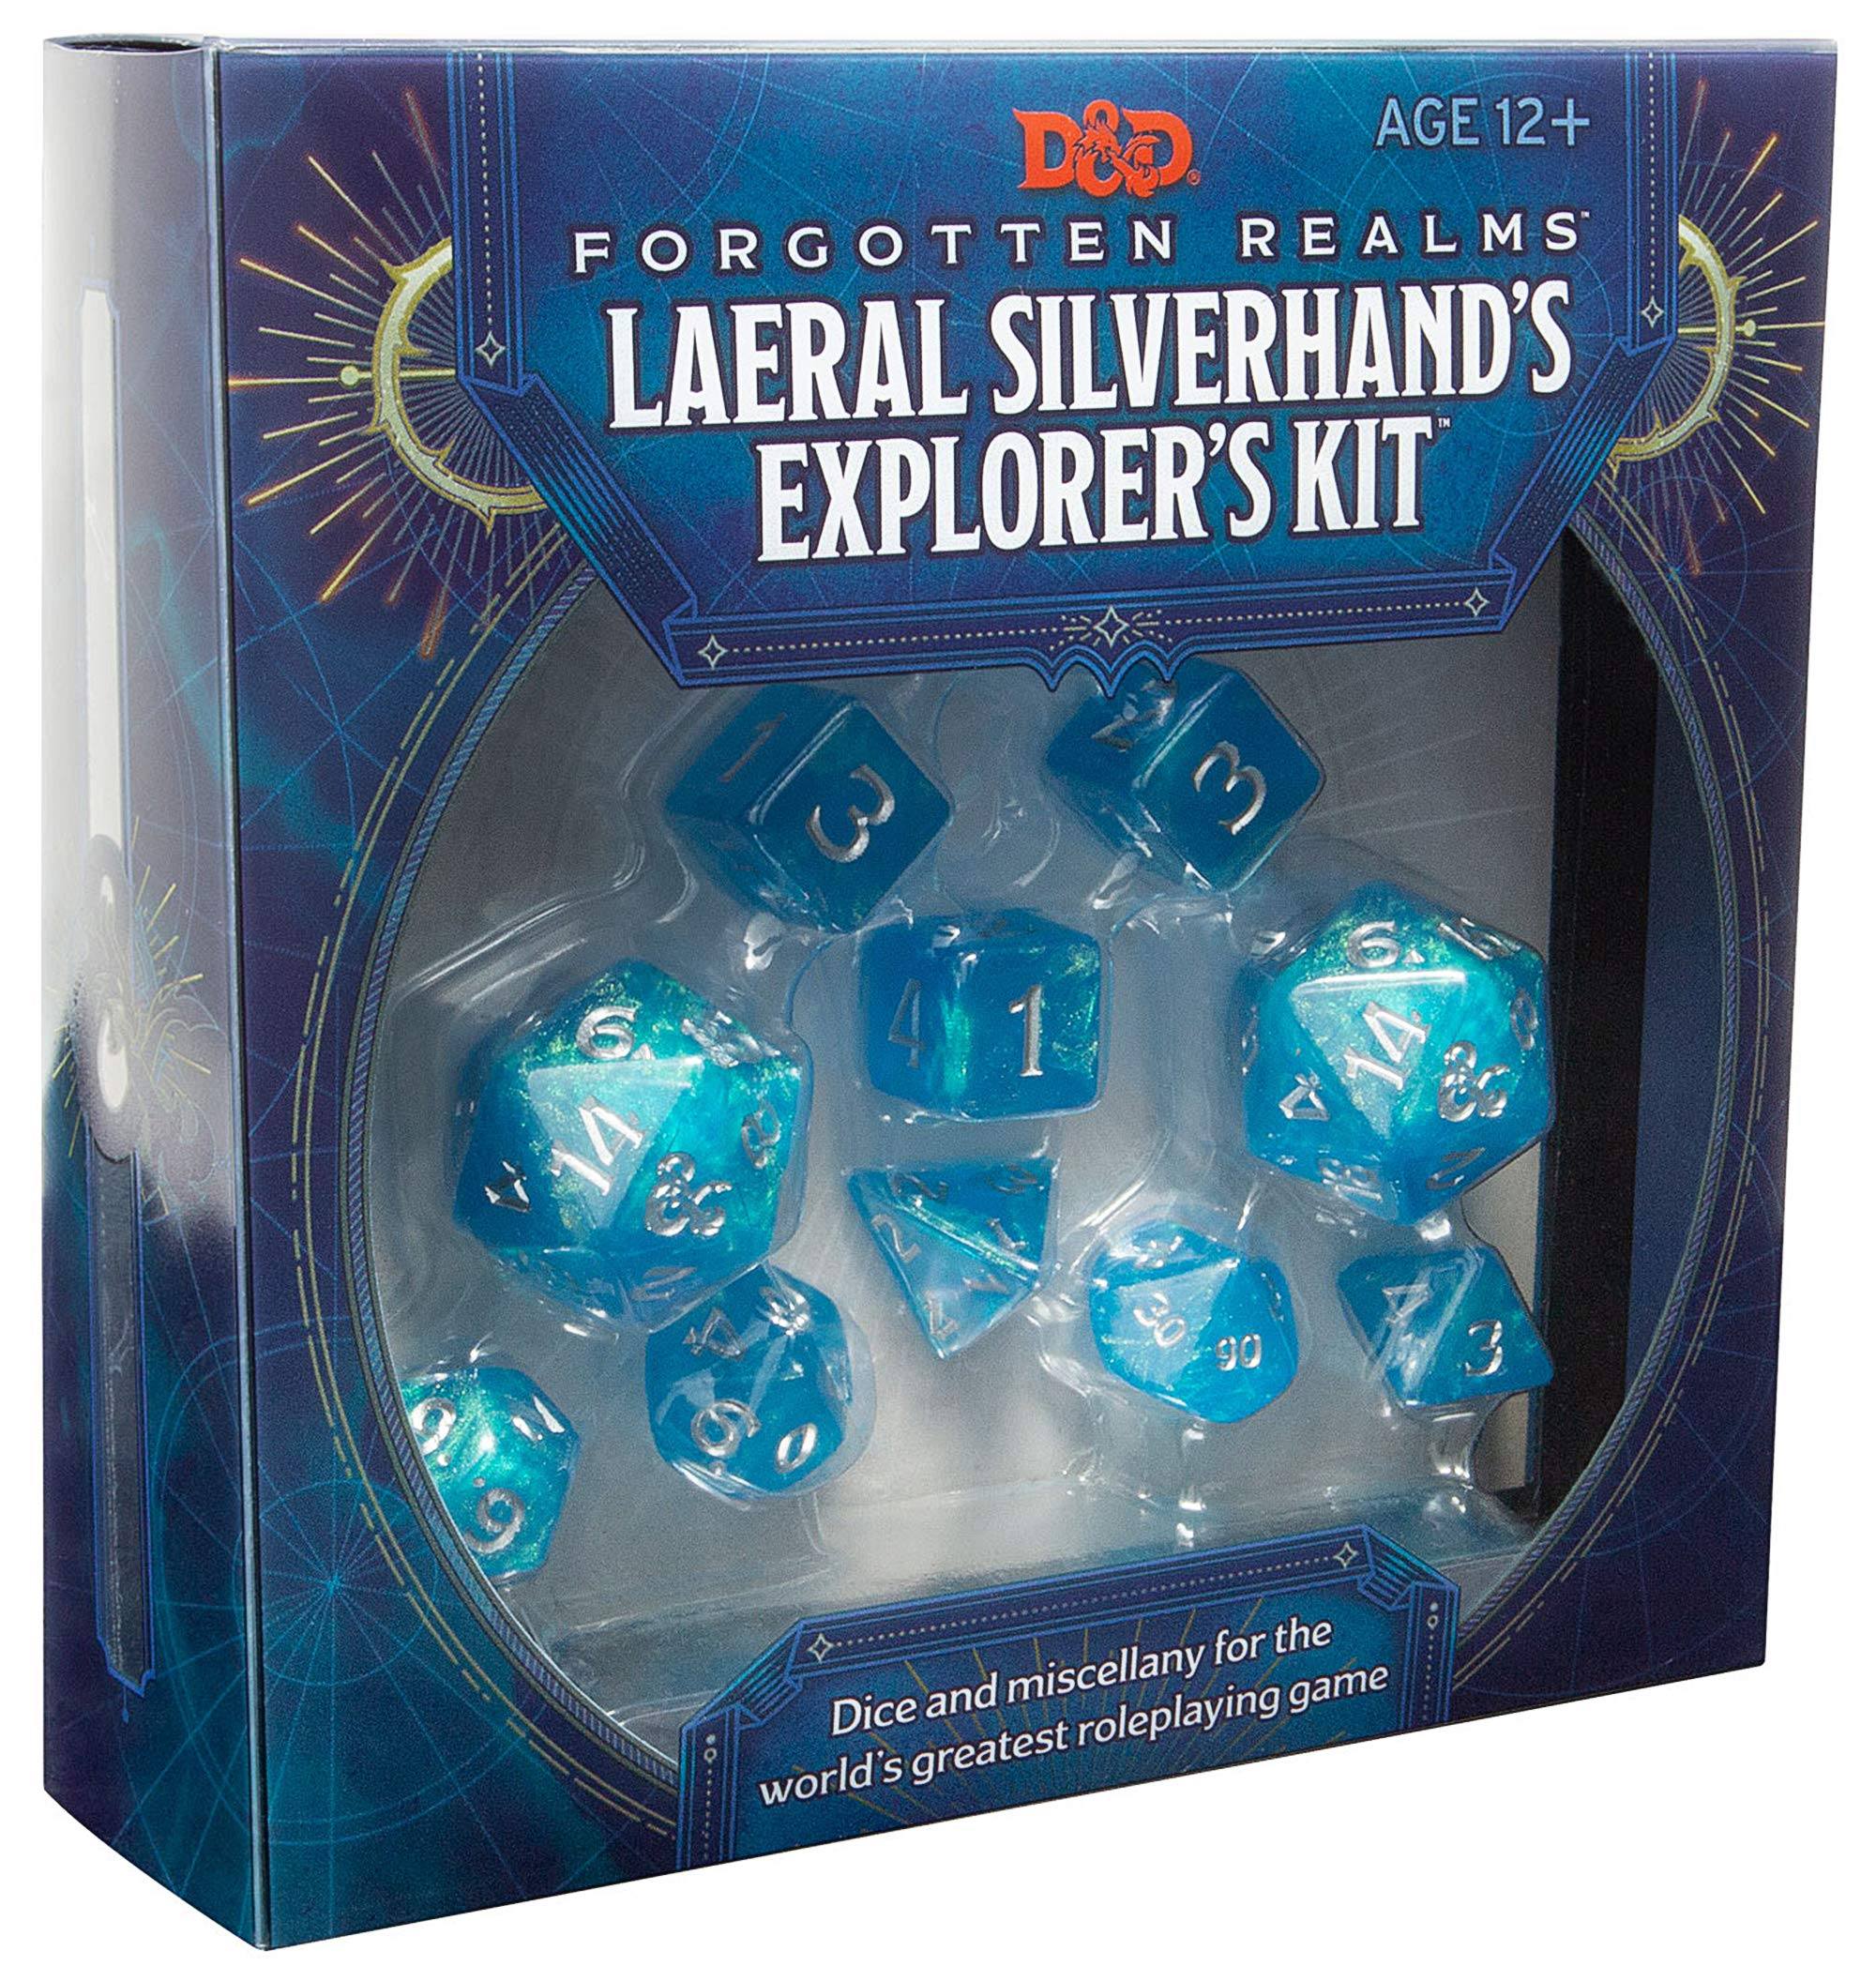 Dungeons & Dragons - Laeral Silver hand's Explorer's (D&D) (WTCC7868)